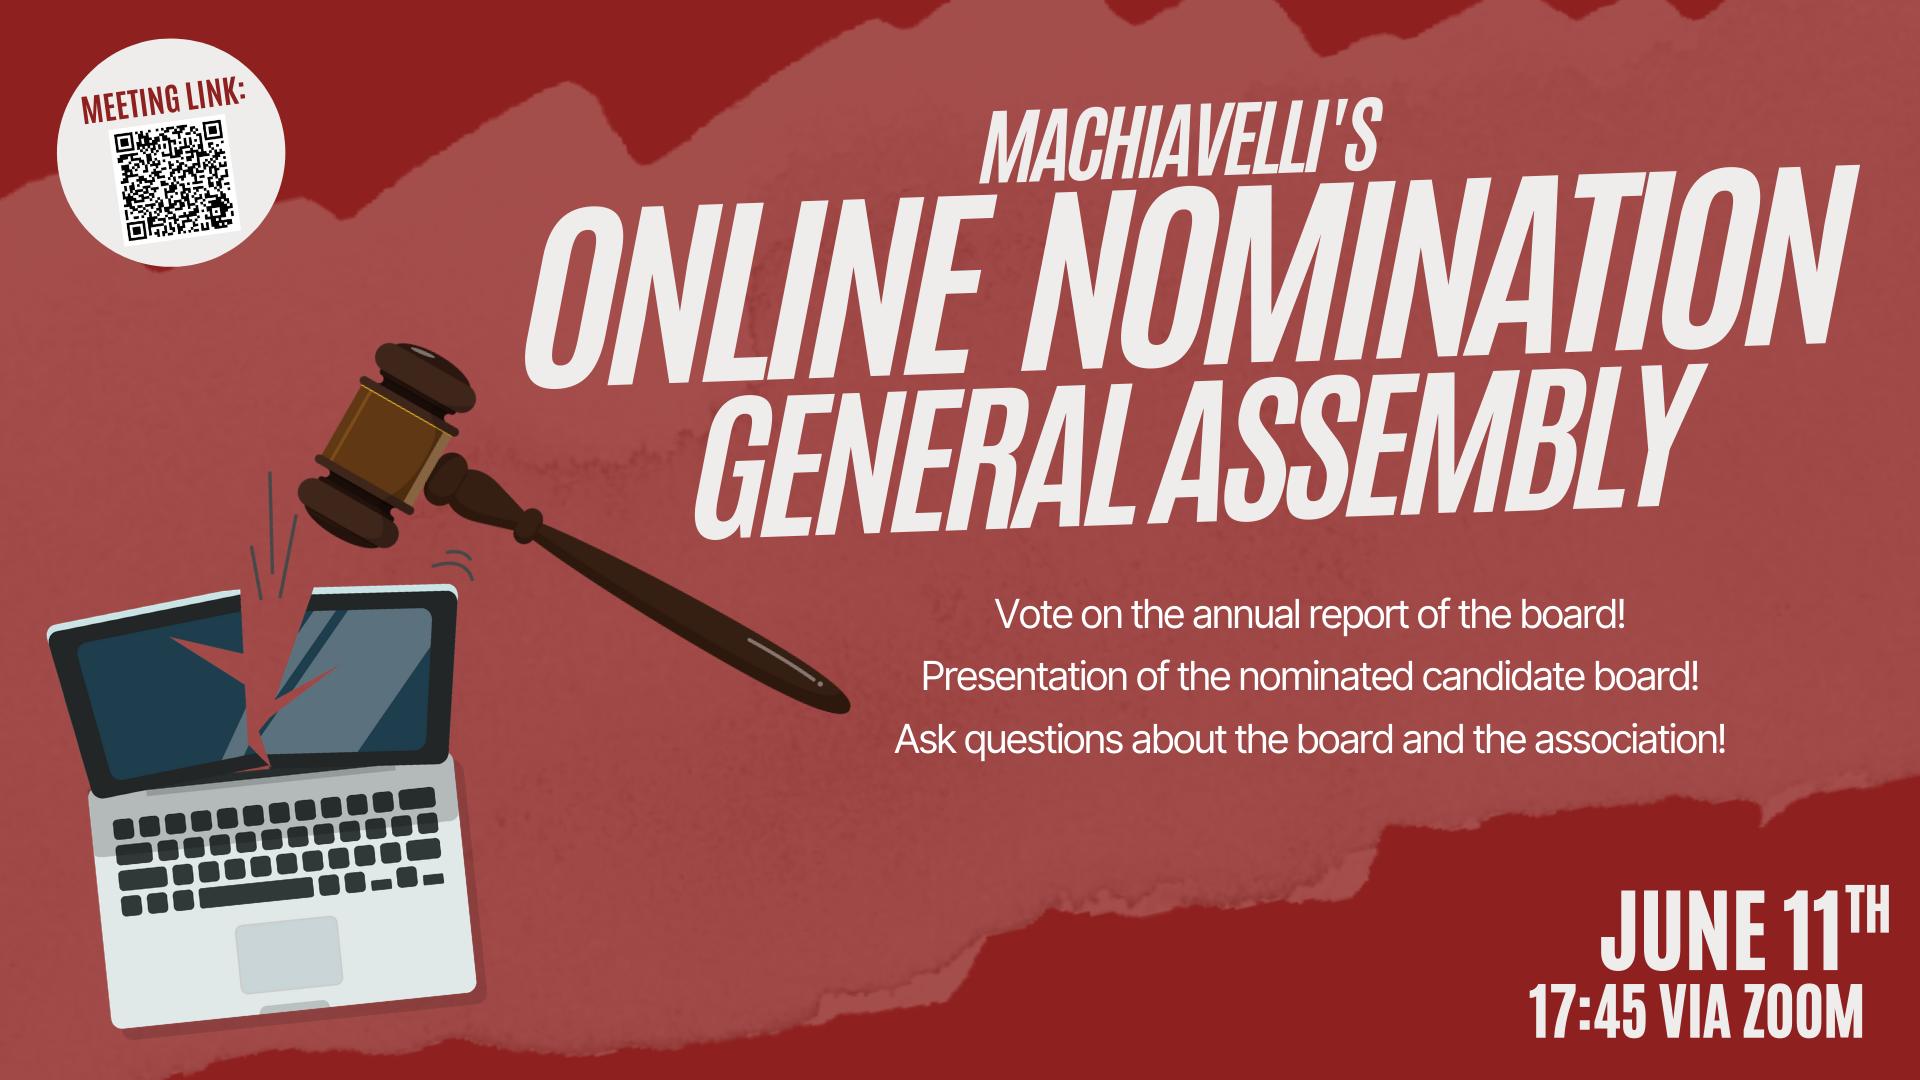 Online Nomination General Assembly